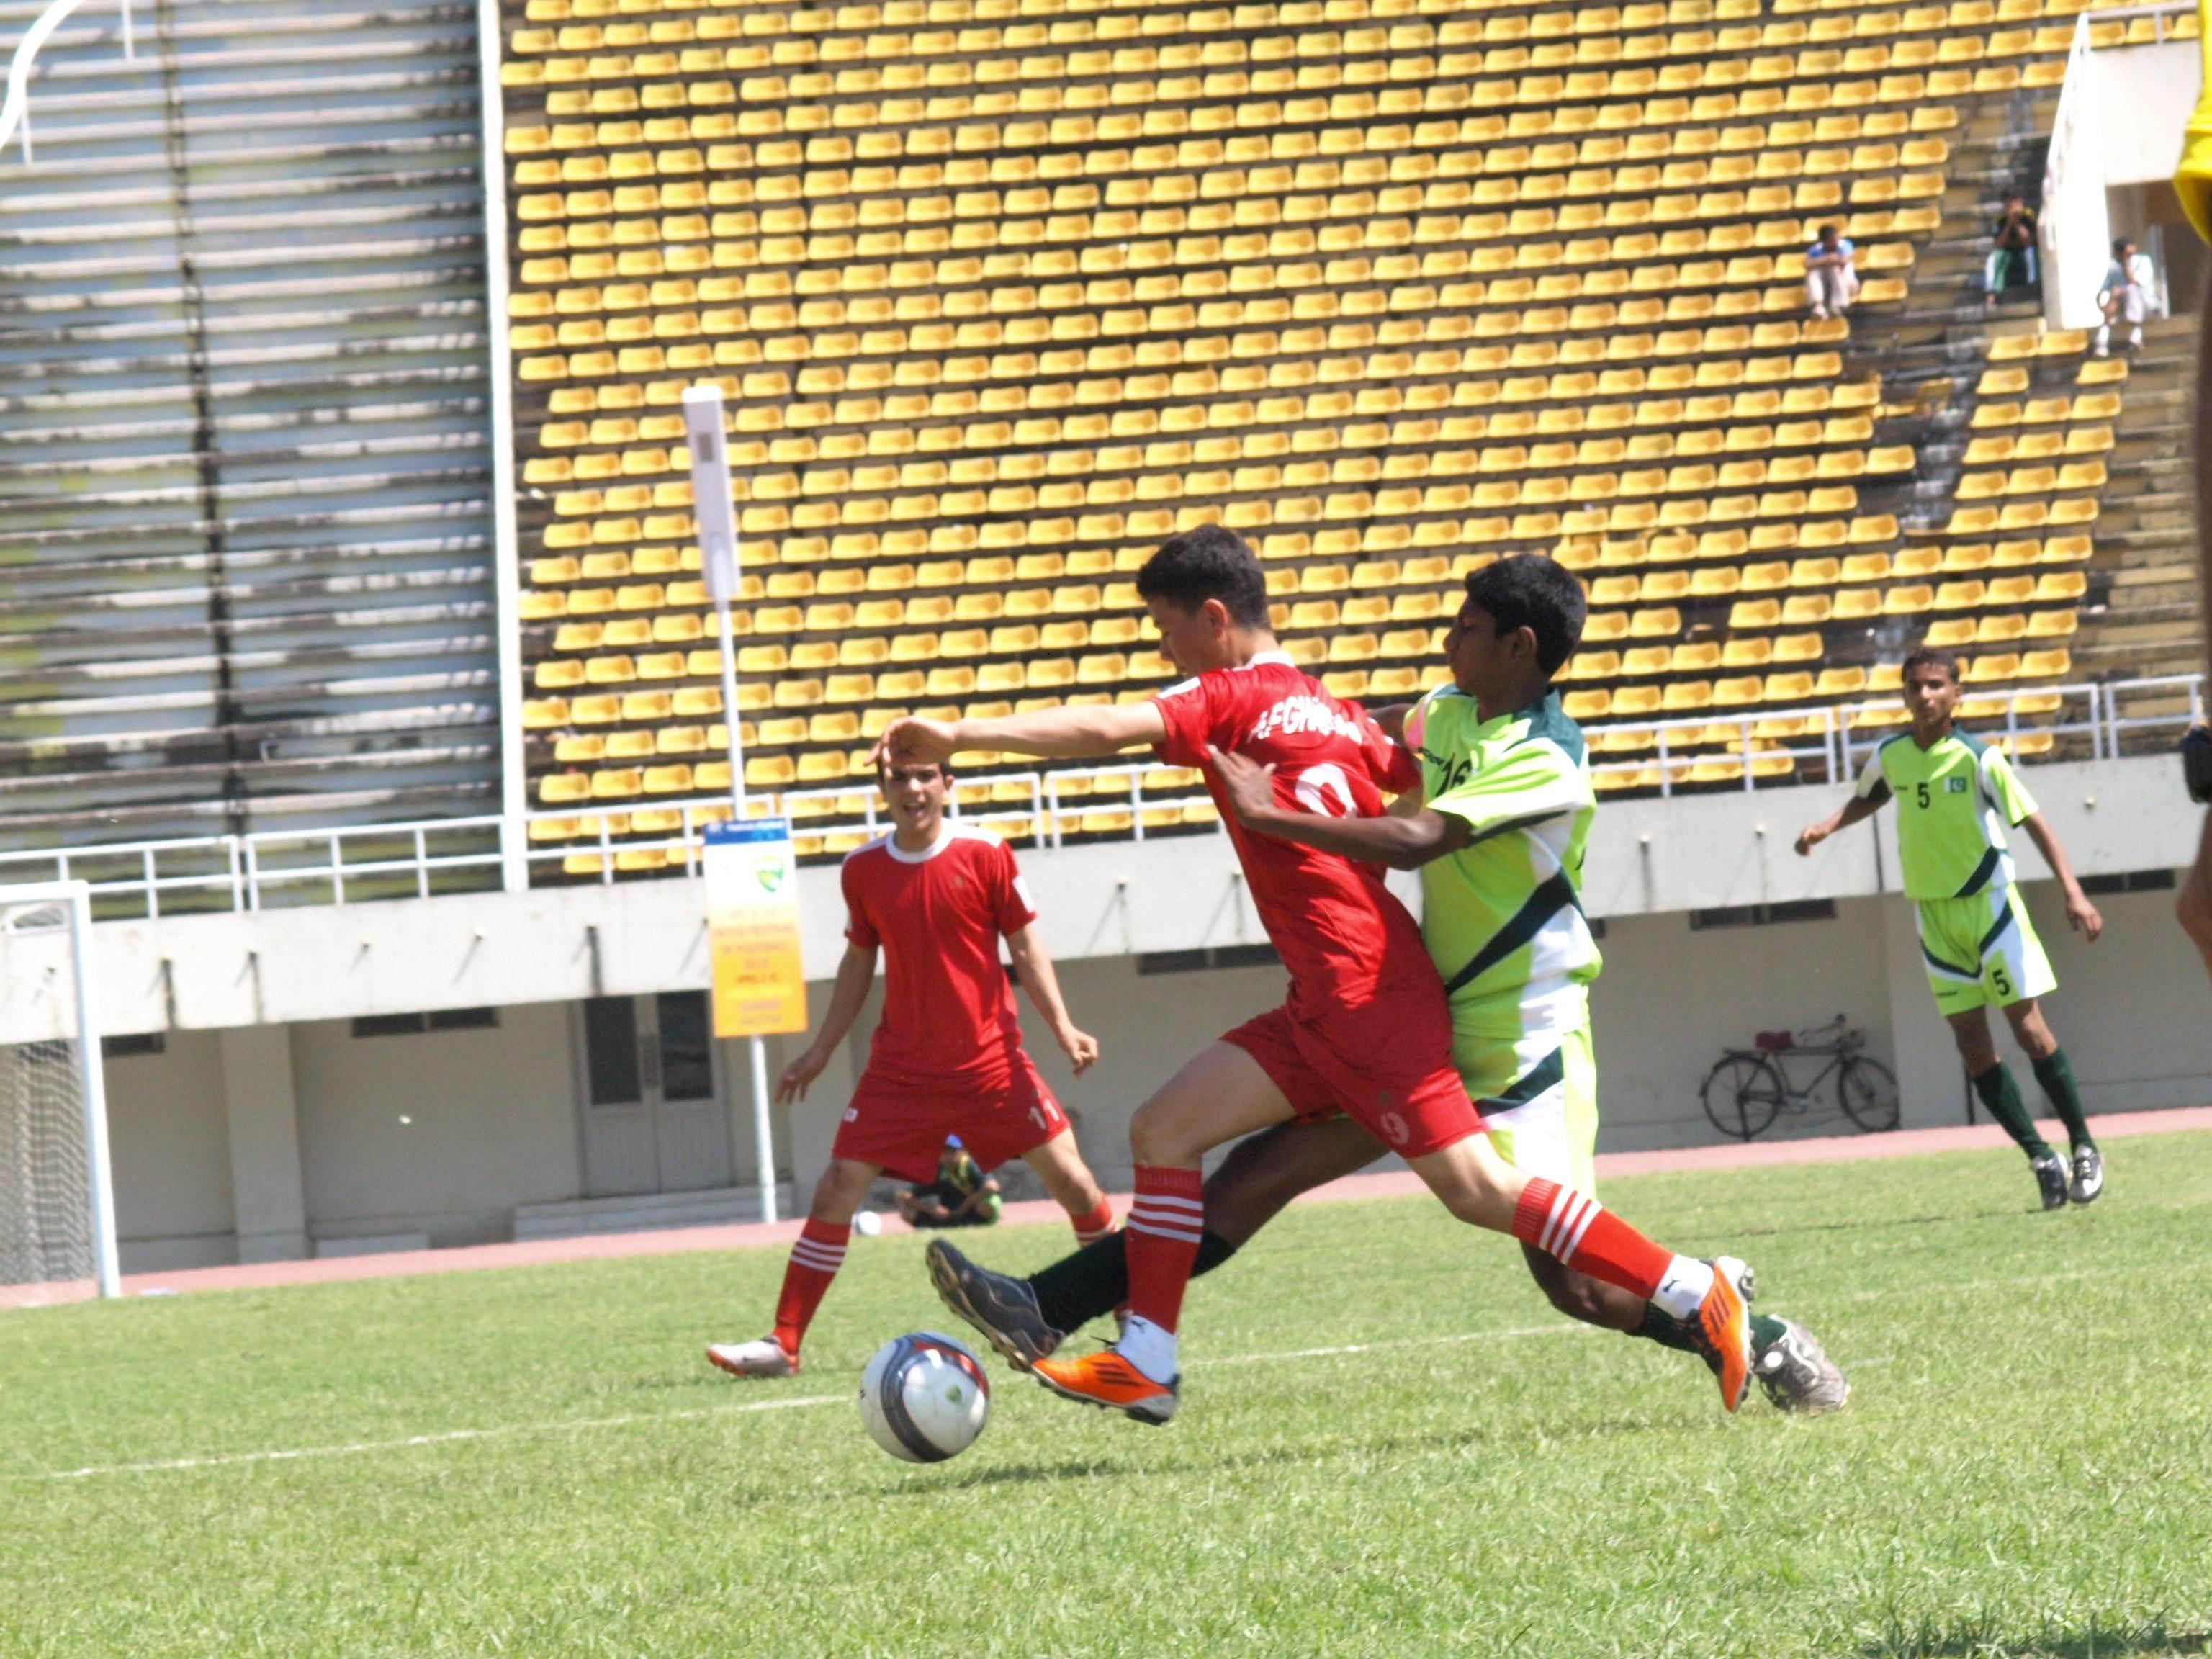 AFC U-14 (Boys) Festival of Football, Islamabad Match Results, April 12, 2012